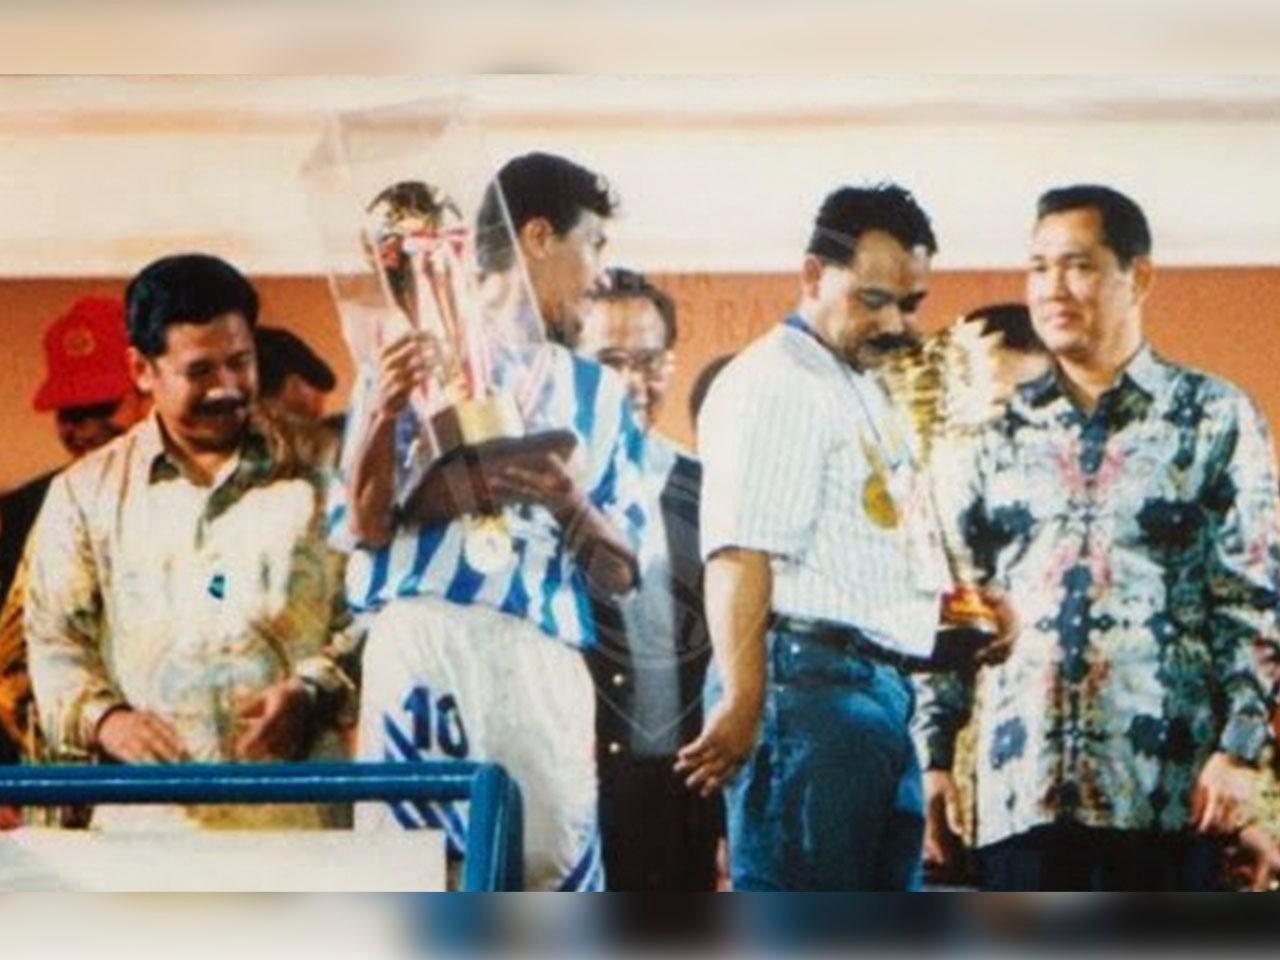 Riwayat Bandung Raya dari Kota Kembang ke Pulau Garam